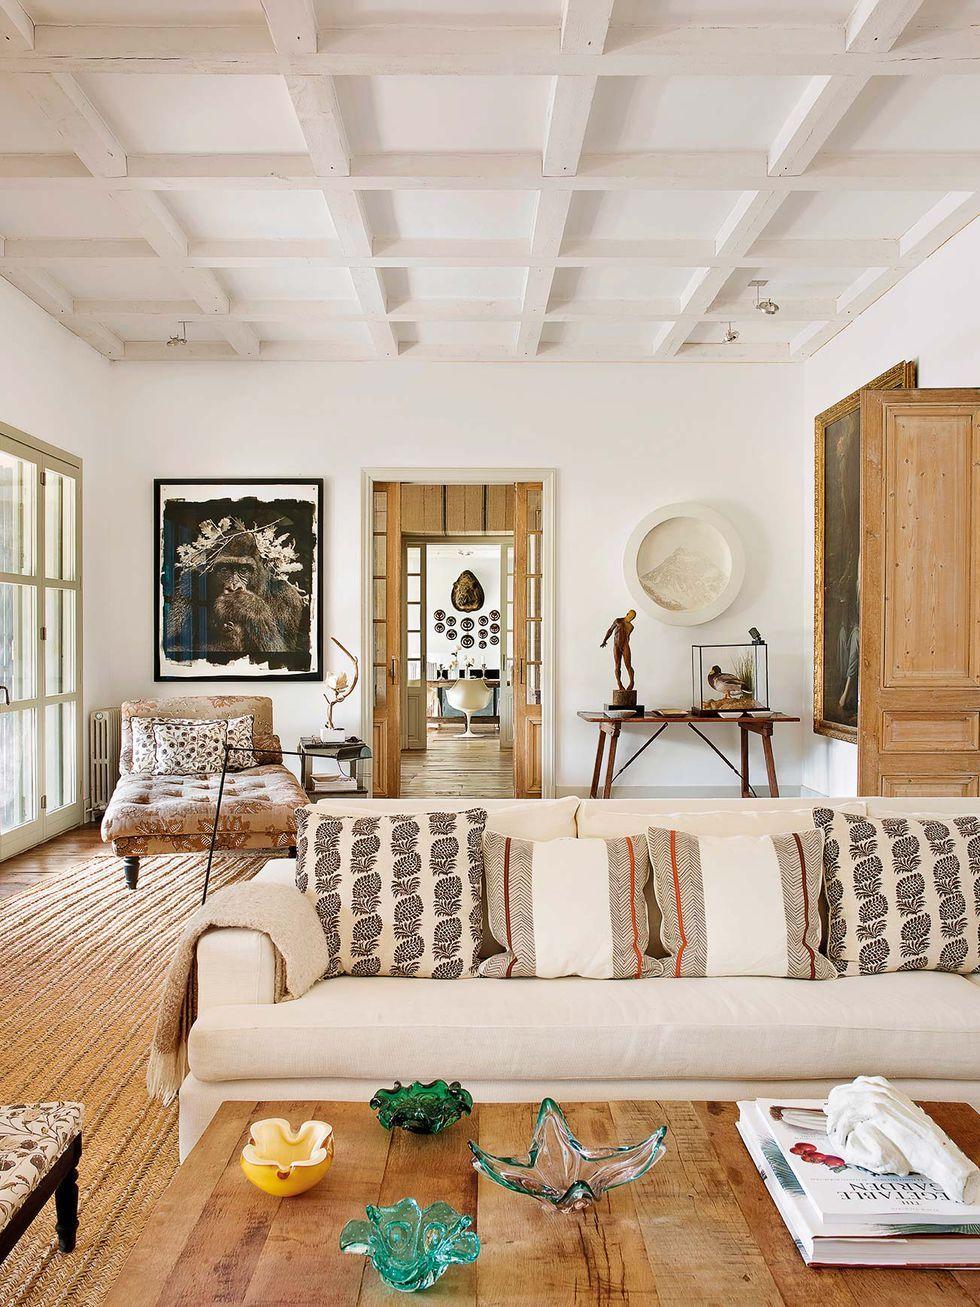 Campo fresco  Diseños de salas, Elle decoracion, Casas de campo